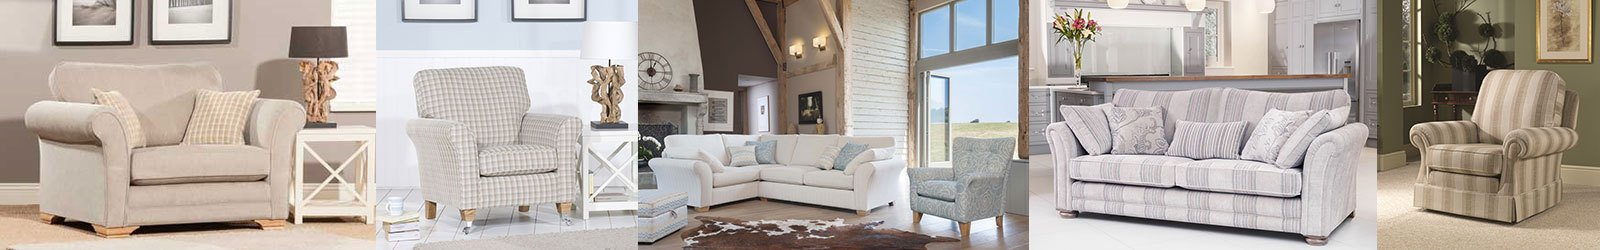 Living room furniture collage